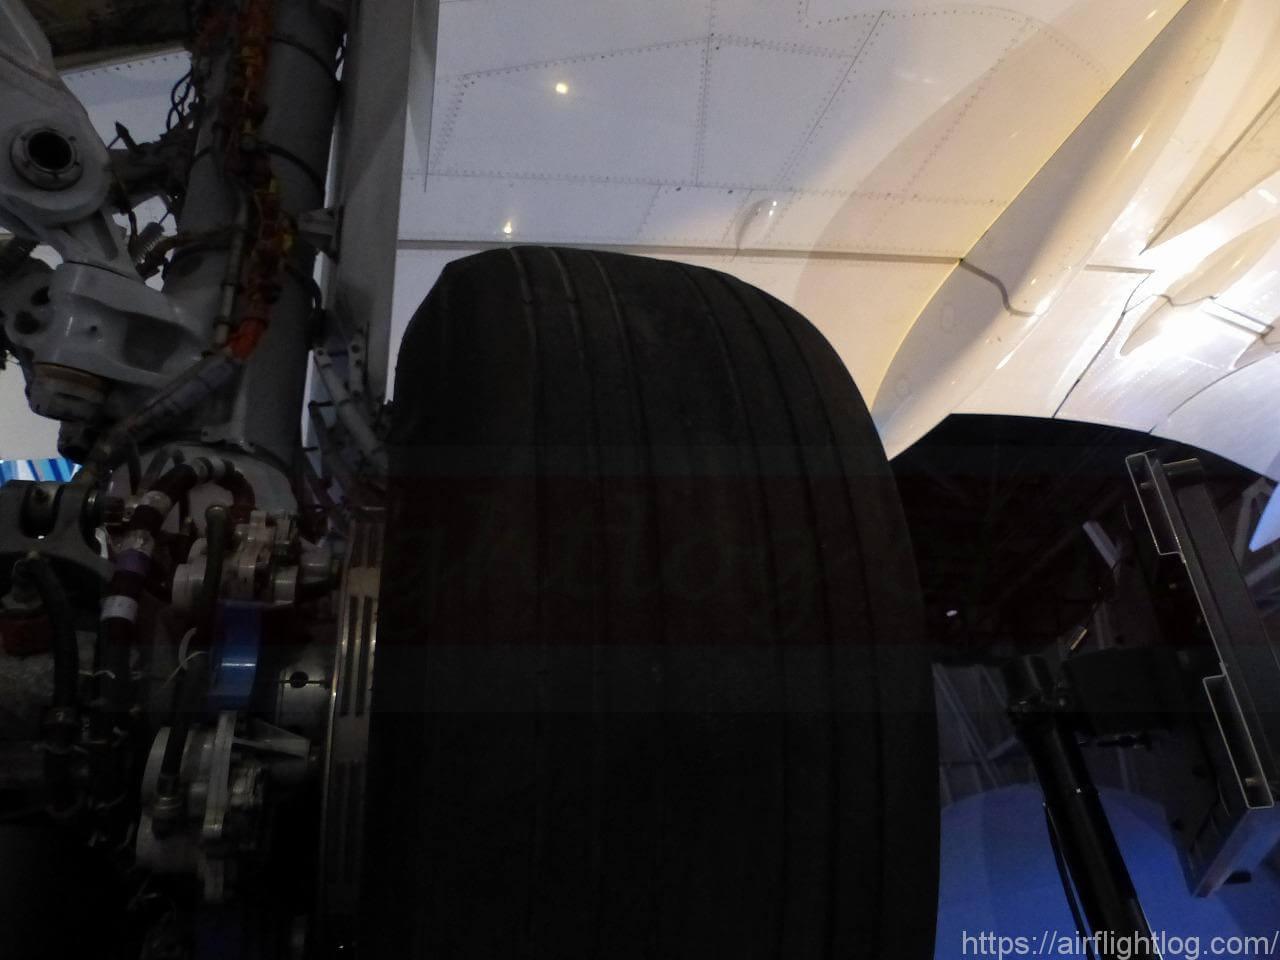 「FLIGHT OF DREAMS(フライト・オブ・ドリームズ)」ボーイング787初号機車輪